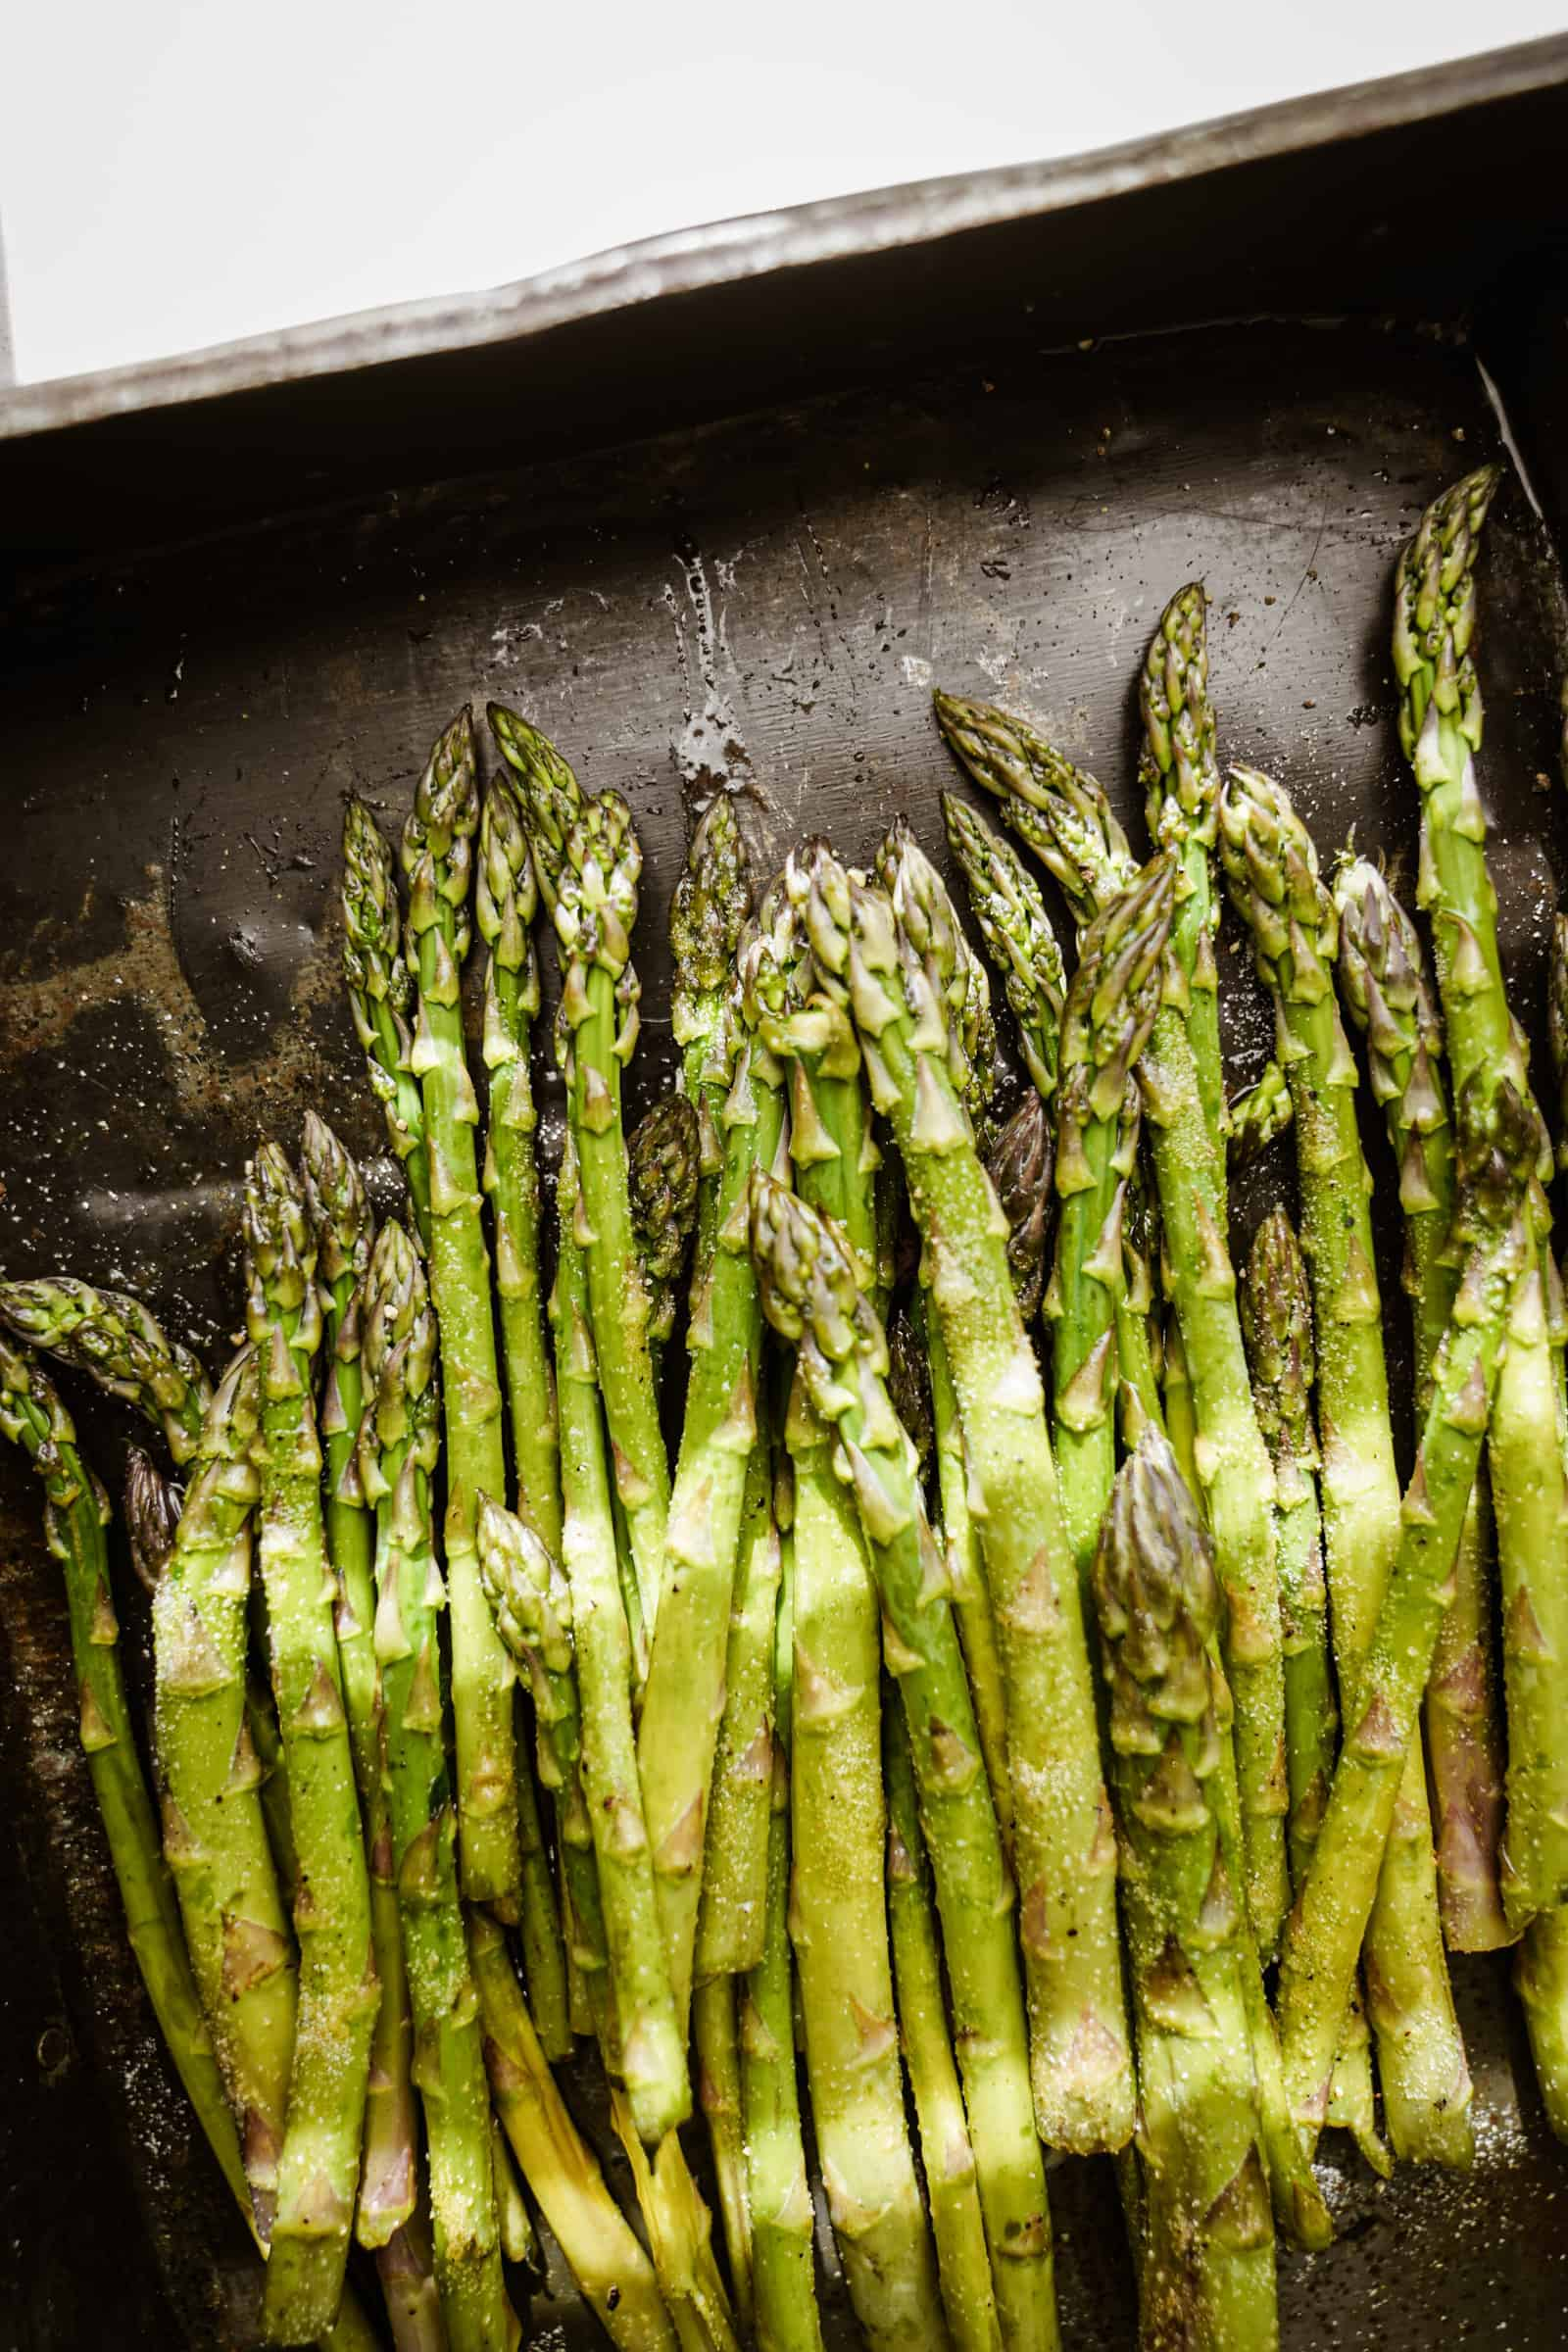 Raw asparagus on a baking tray